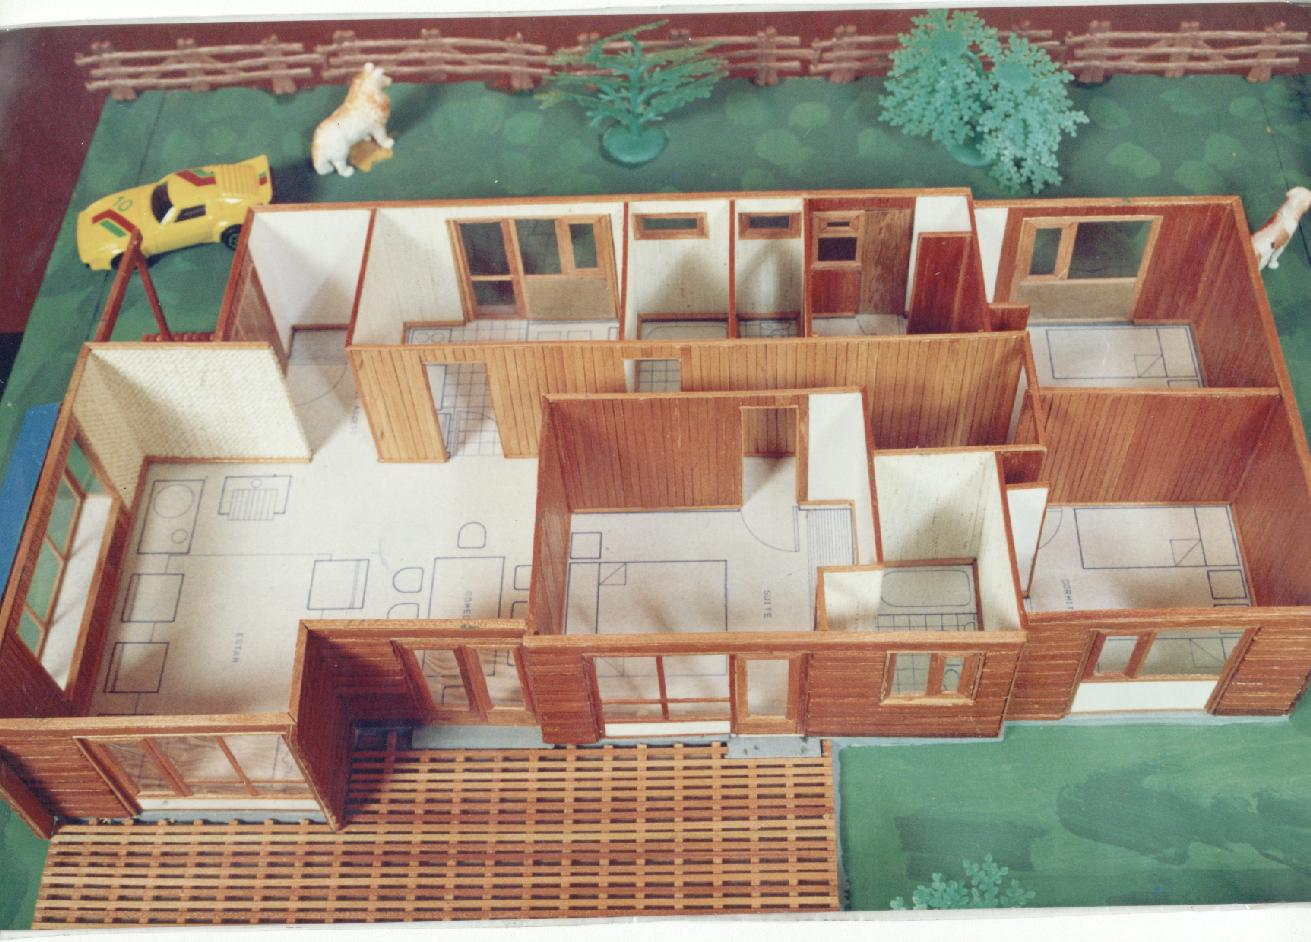 Planos de casas modelos y dise os de casas planos para for Modelos de planos de casas